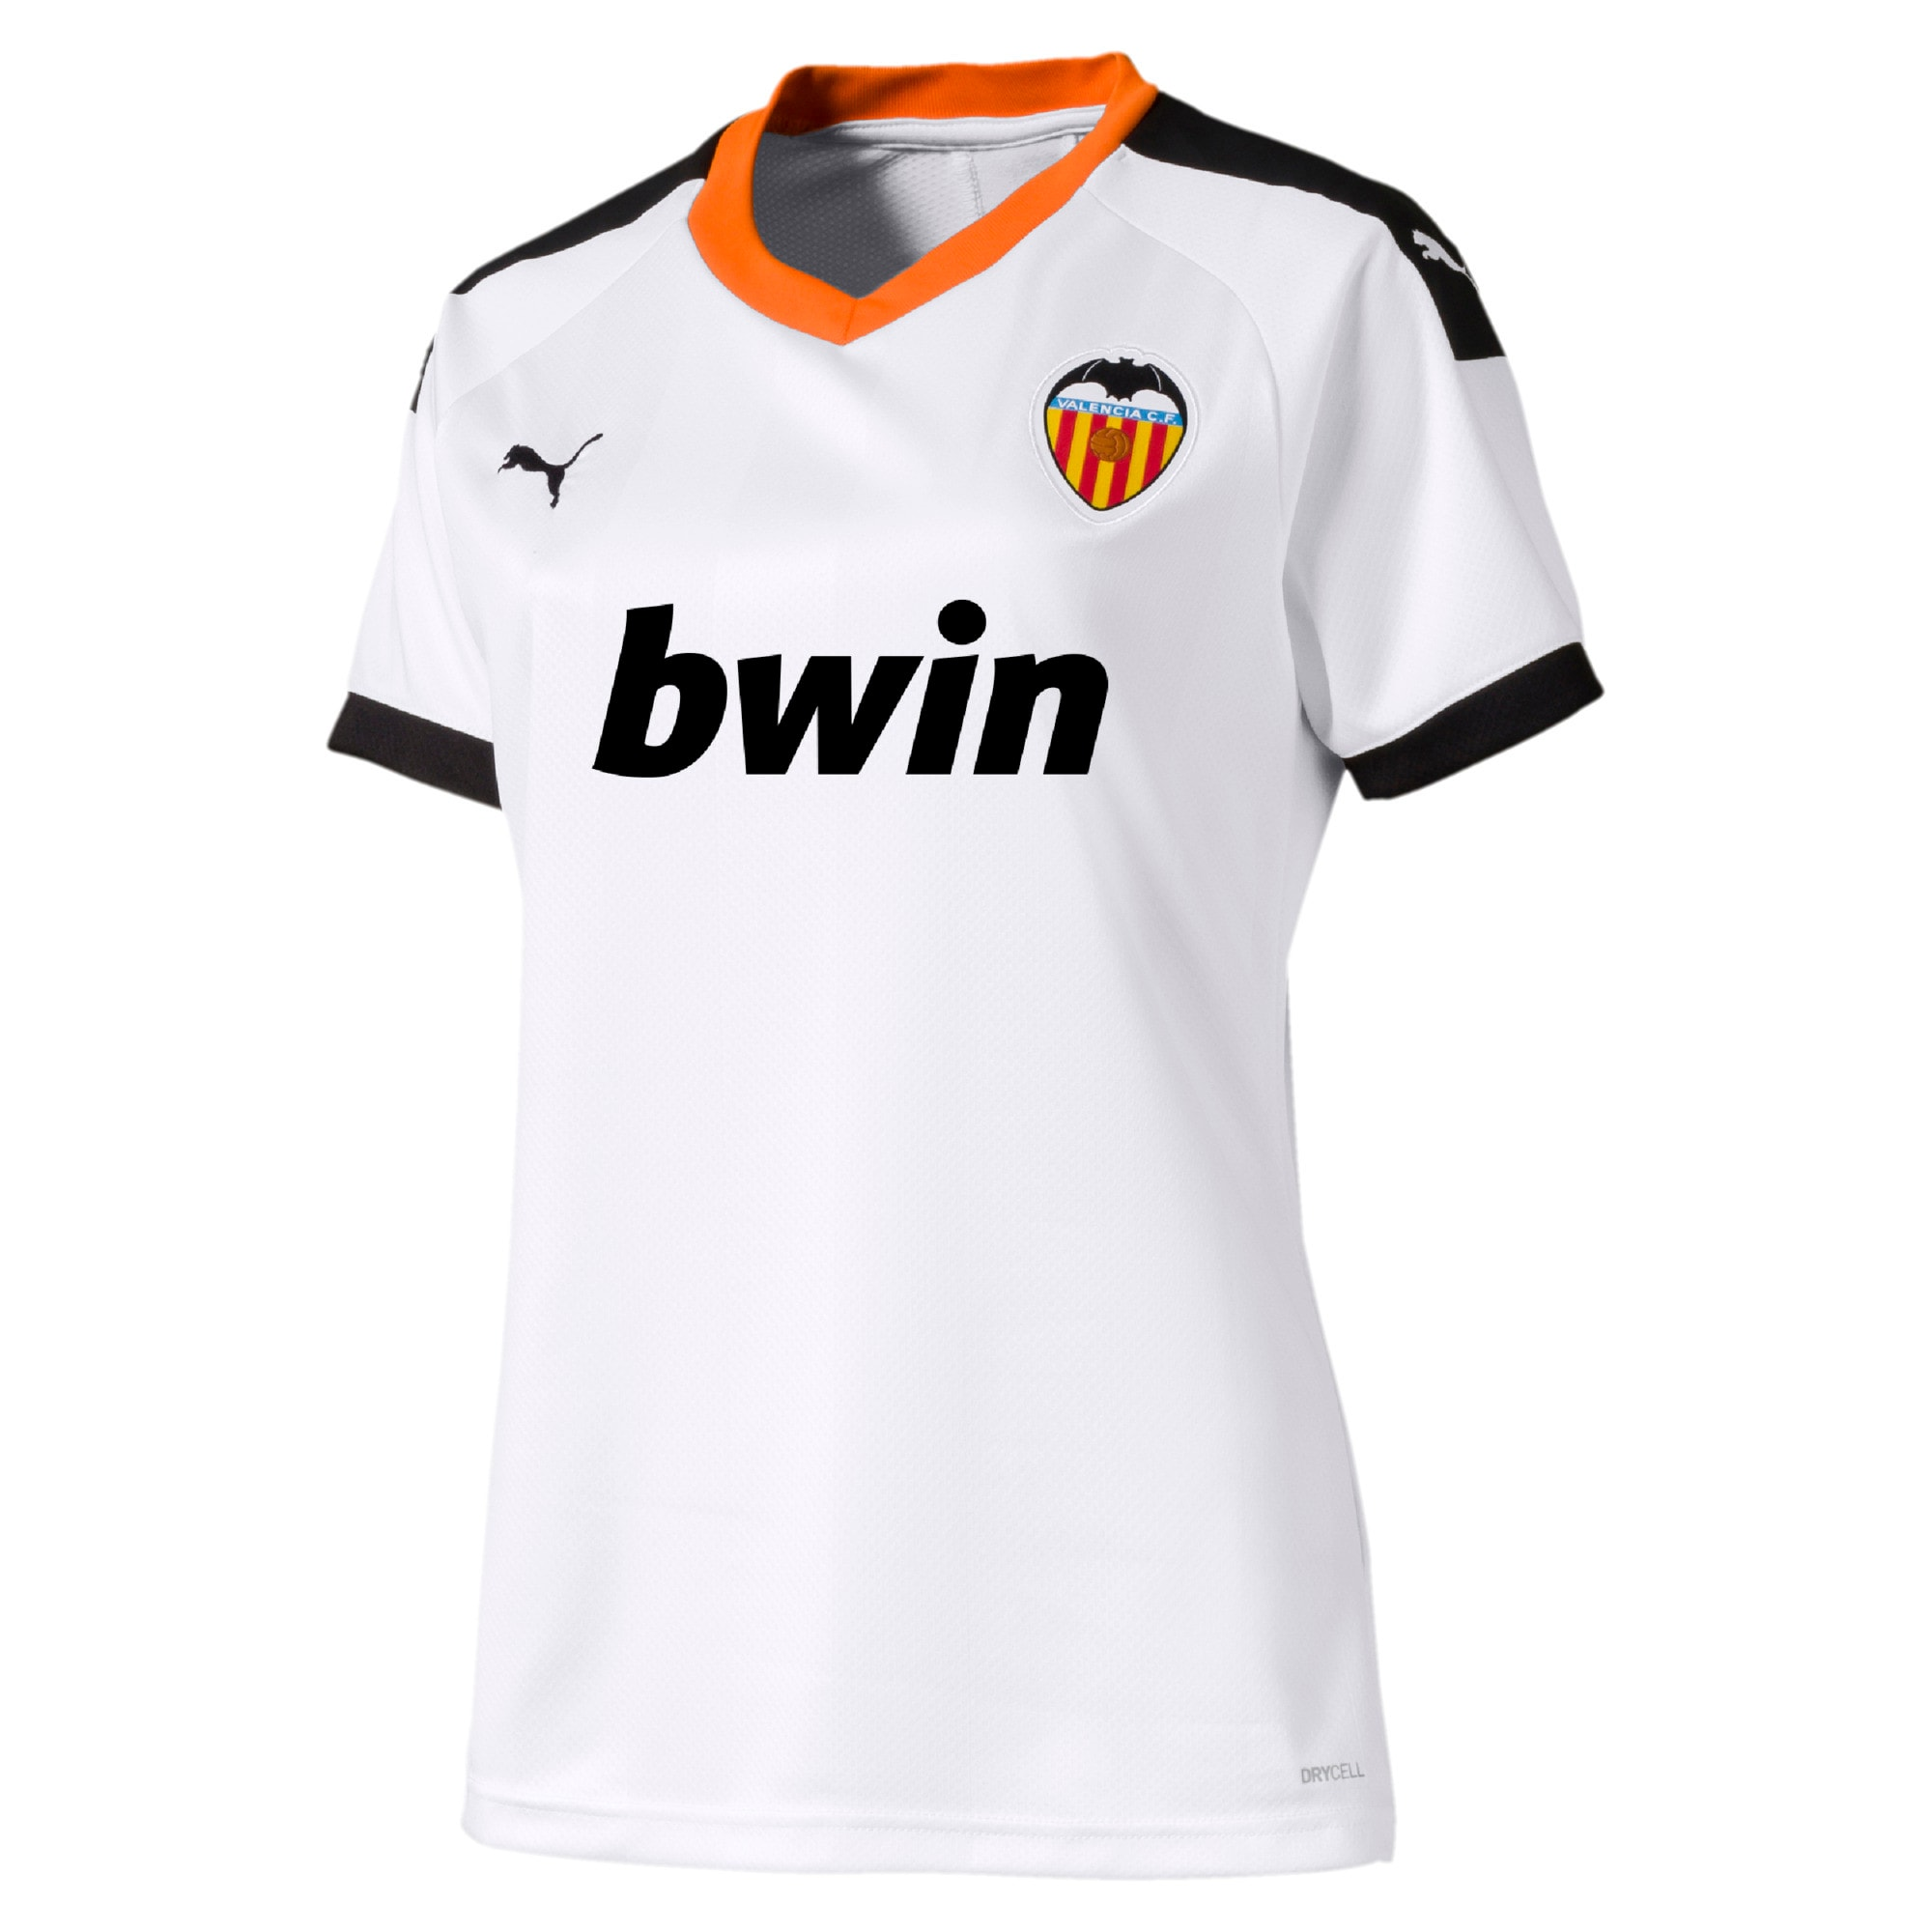 Thumbnail 1 of Valencia CF Women's Home Replica Jersey, White- Black-Vibrant Orange, medium